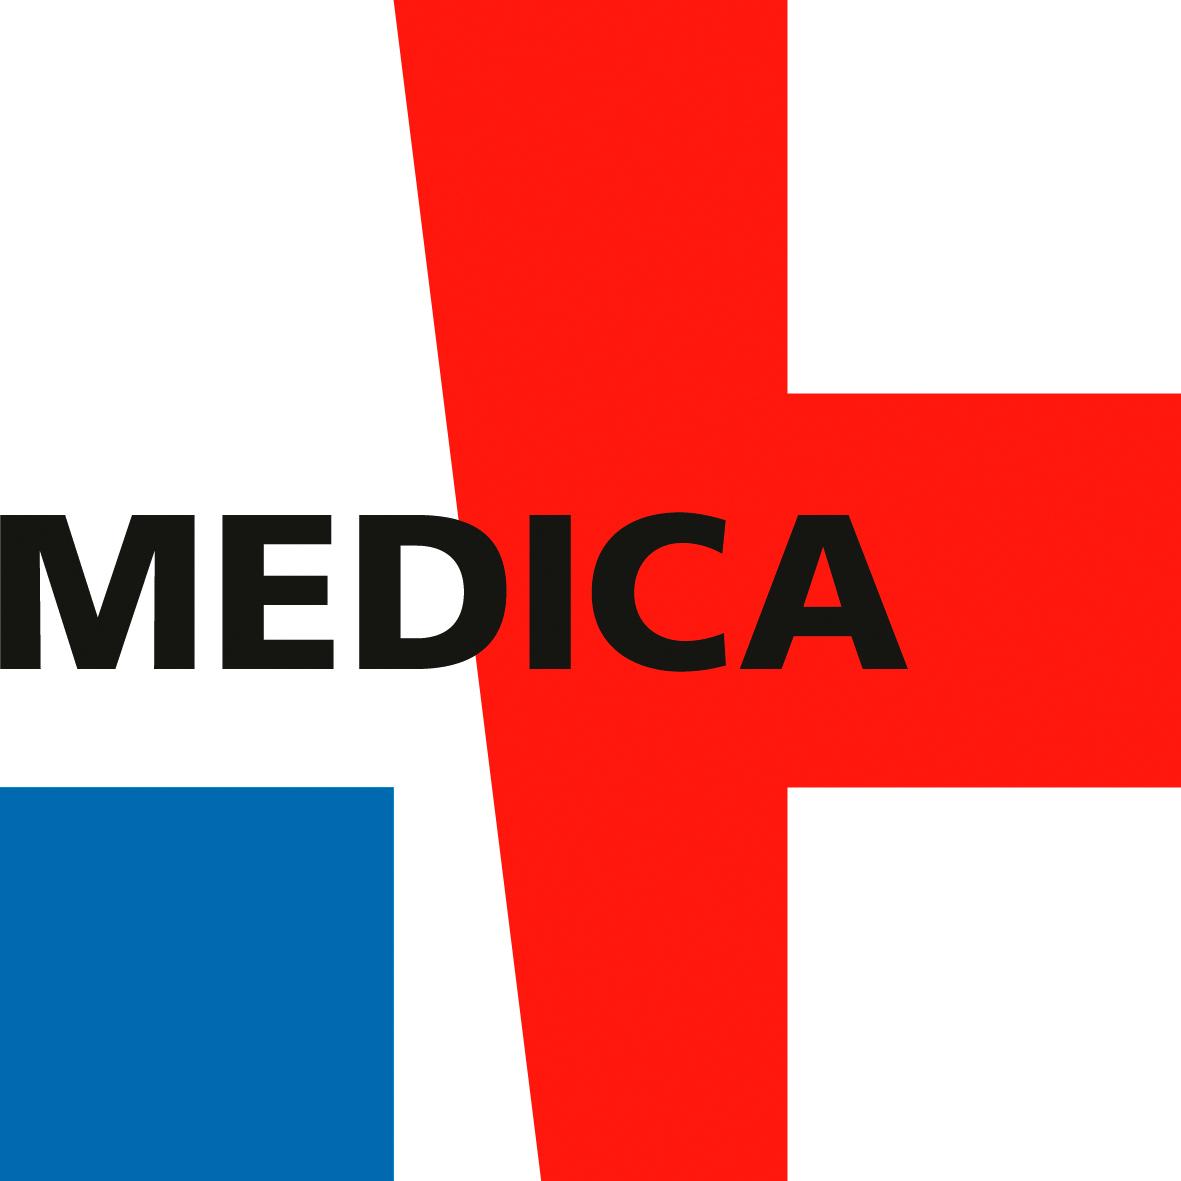 https://www.medica.de/cgi-bin/md_medica/lib/all/lob/return_download.cgi/medica_logo_srgb.jpg?ticket=g_u_e_s_t&bid=13562&no_mime_type=0